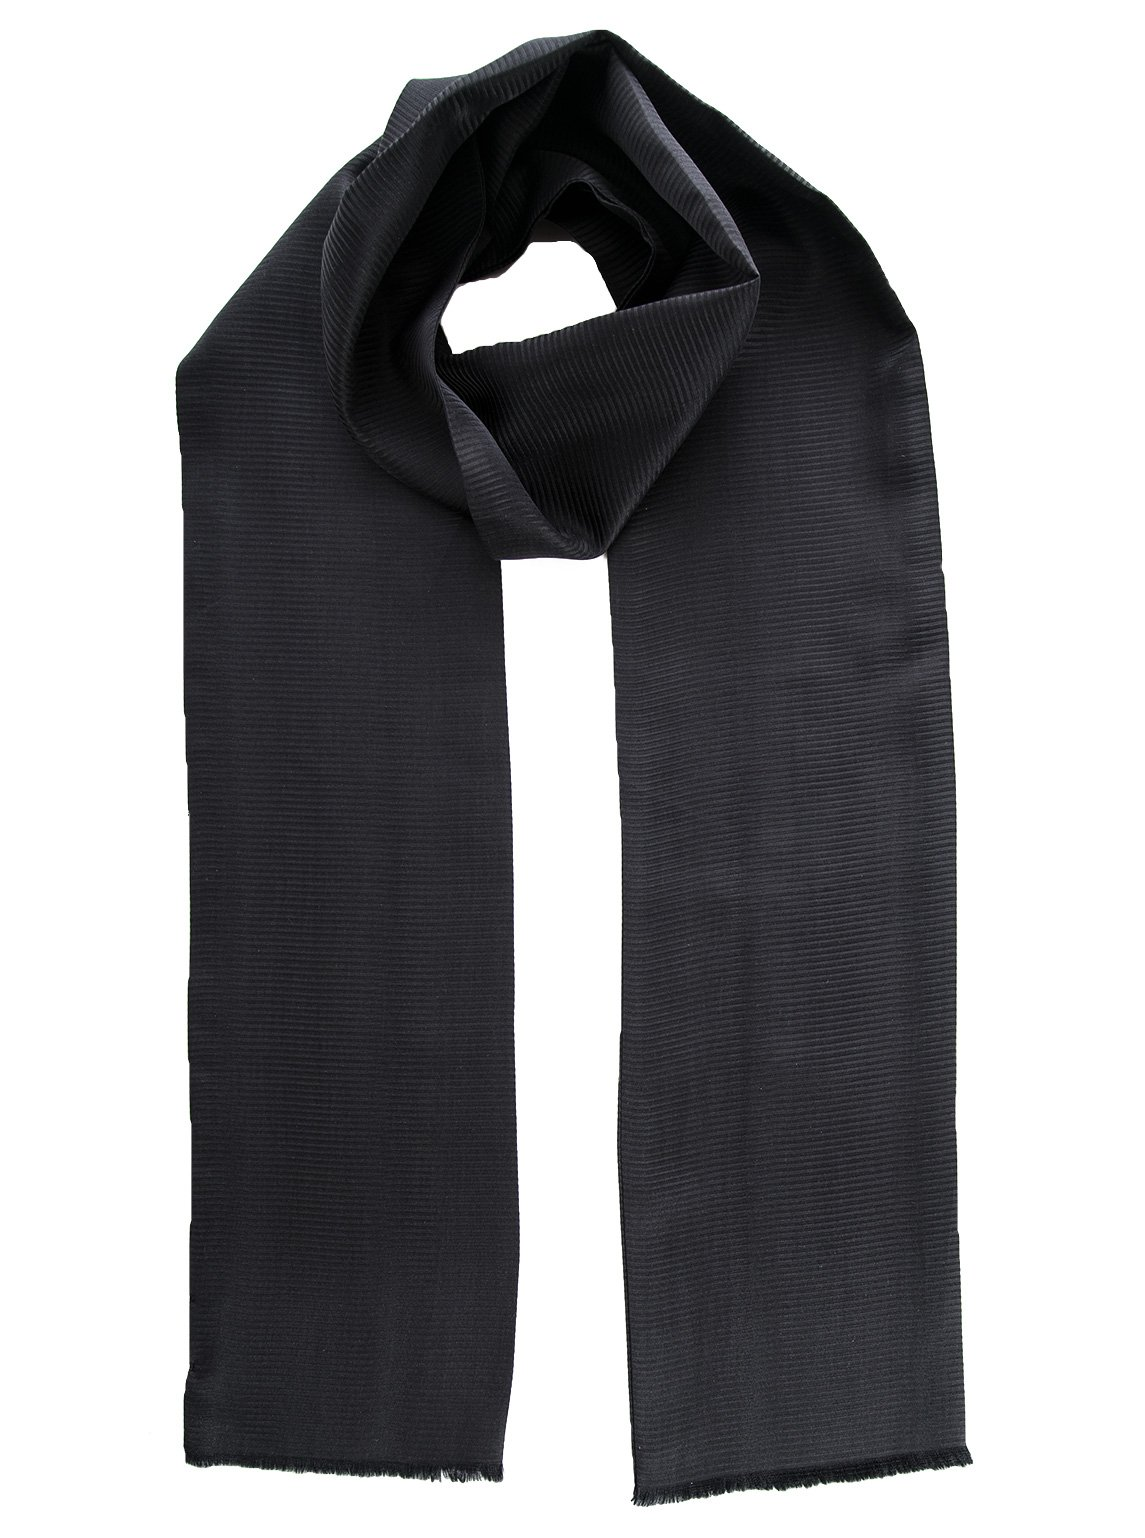 Elizabetta Men's Italian Silk Tuxedo Opera Scarf, Black, Skinny Style